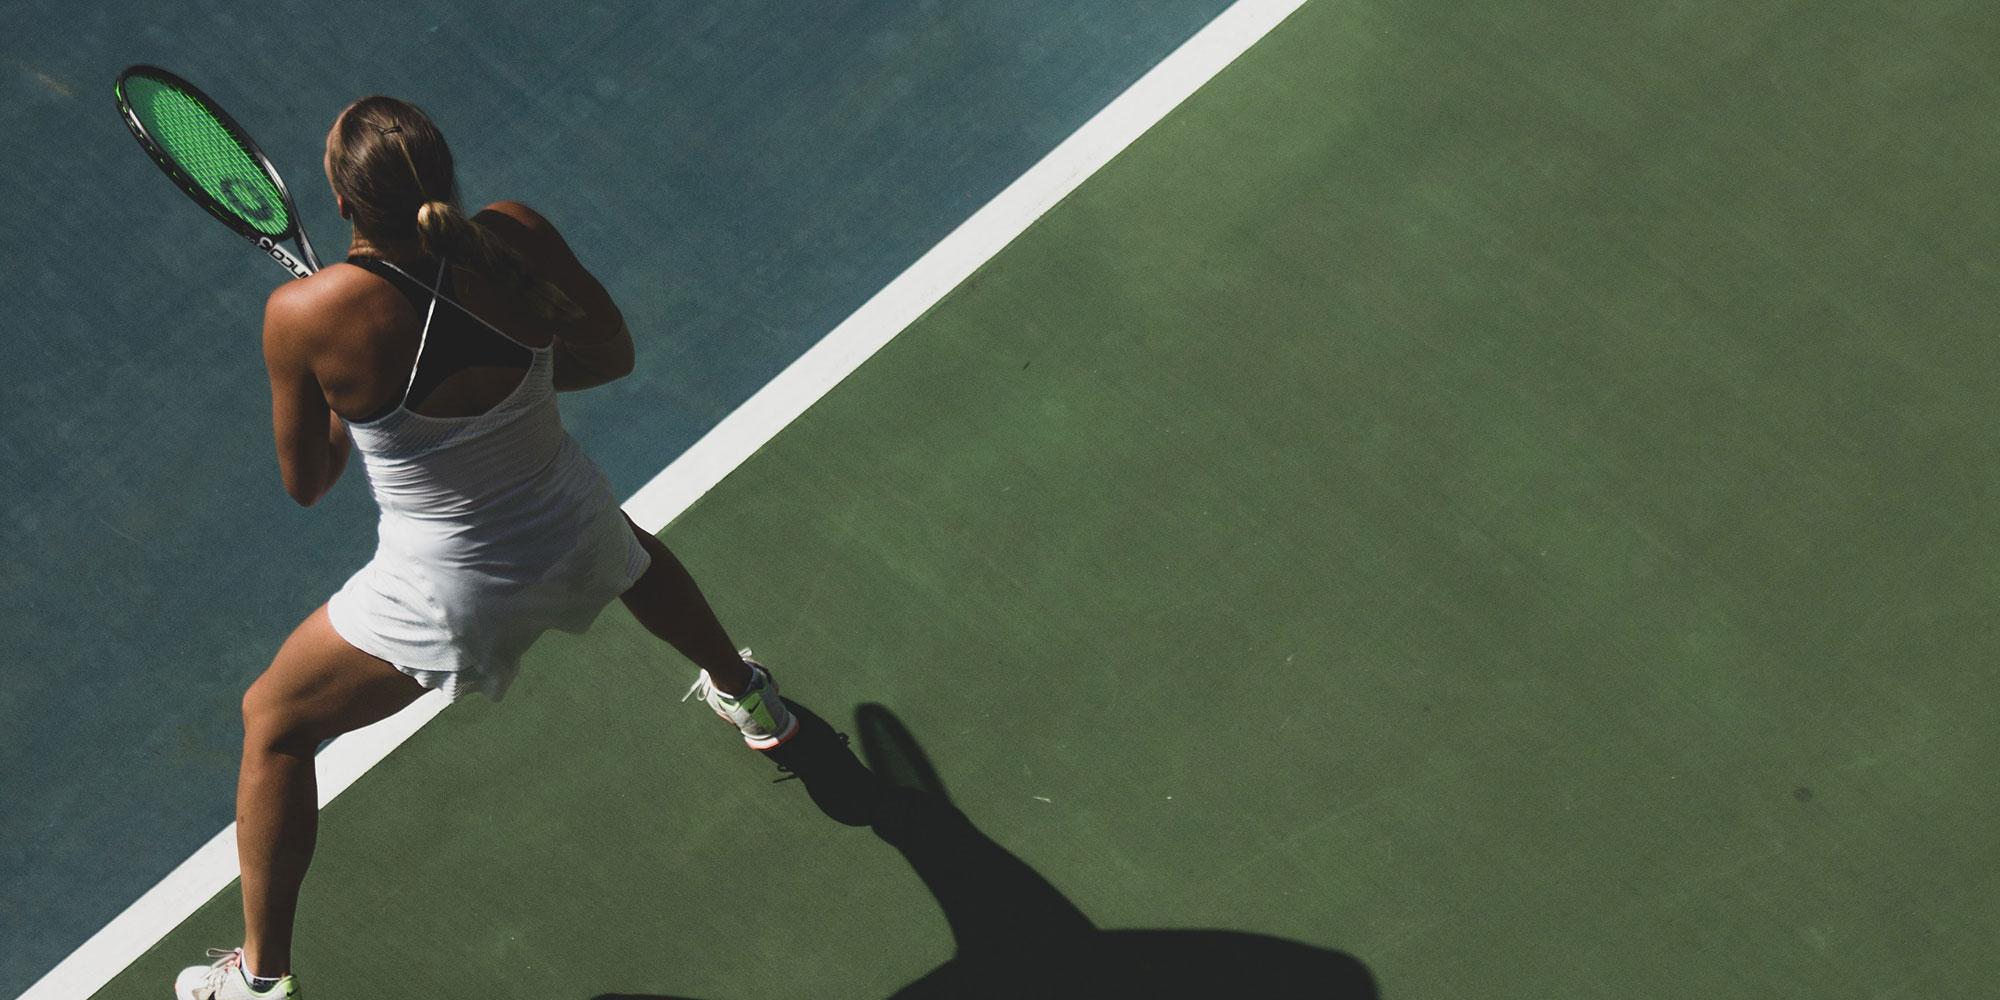 Elite tennis player on court preparing to return a serve